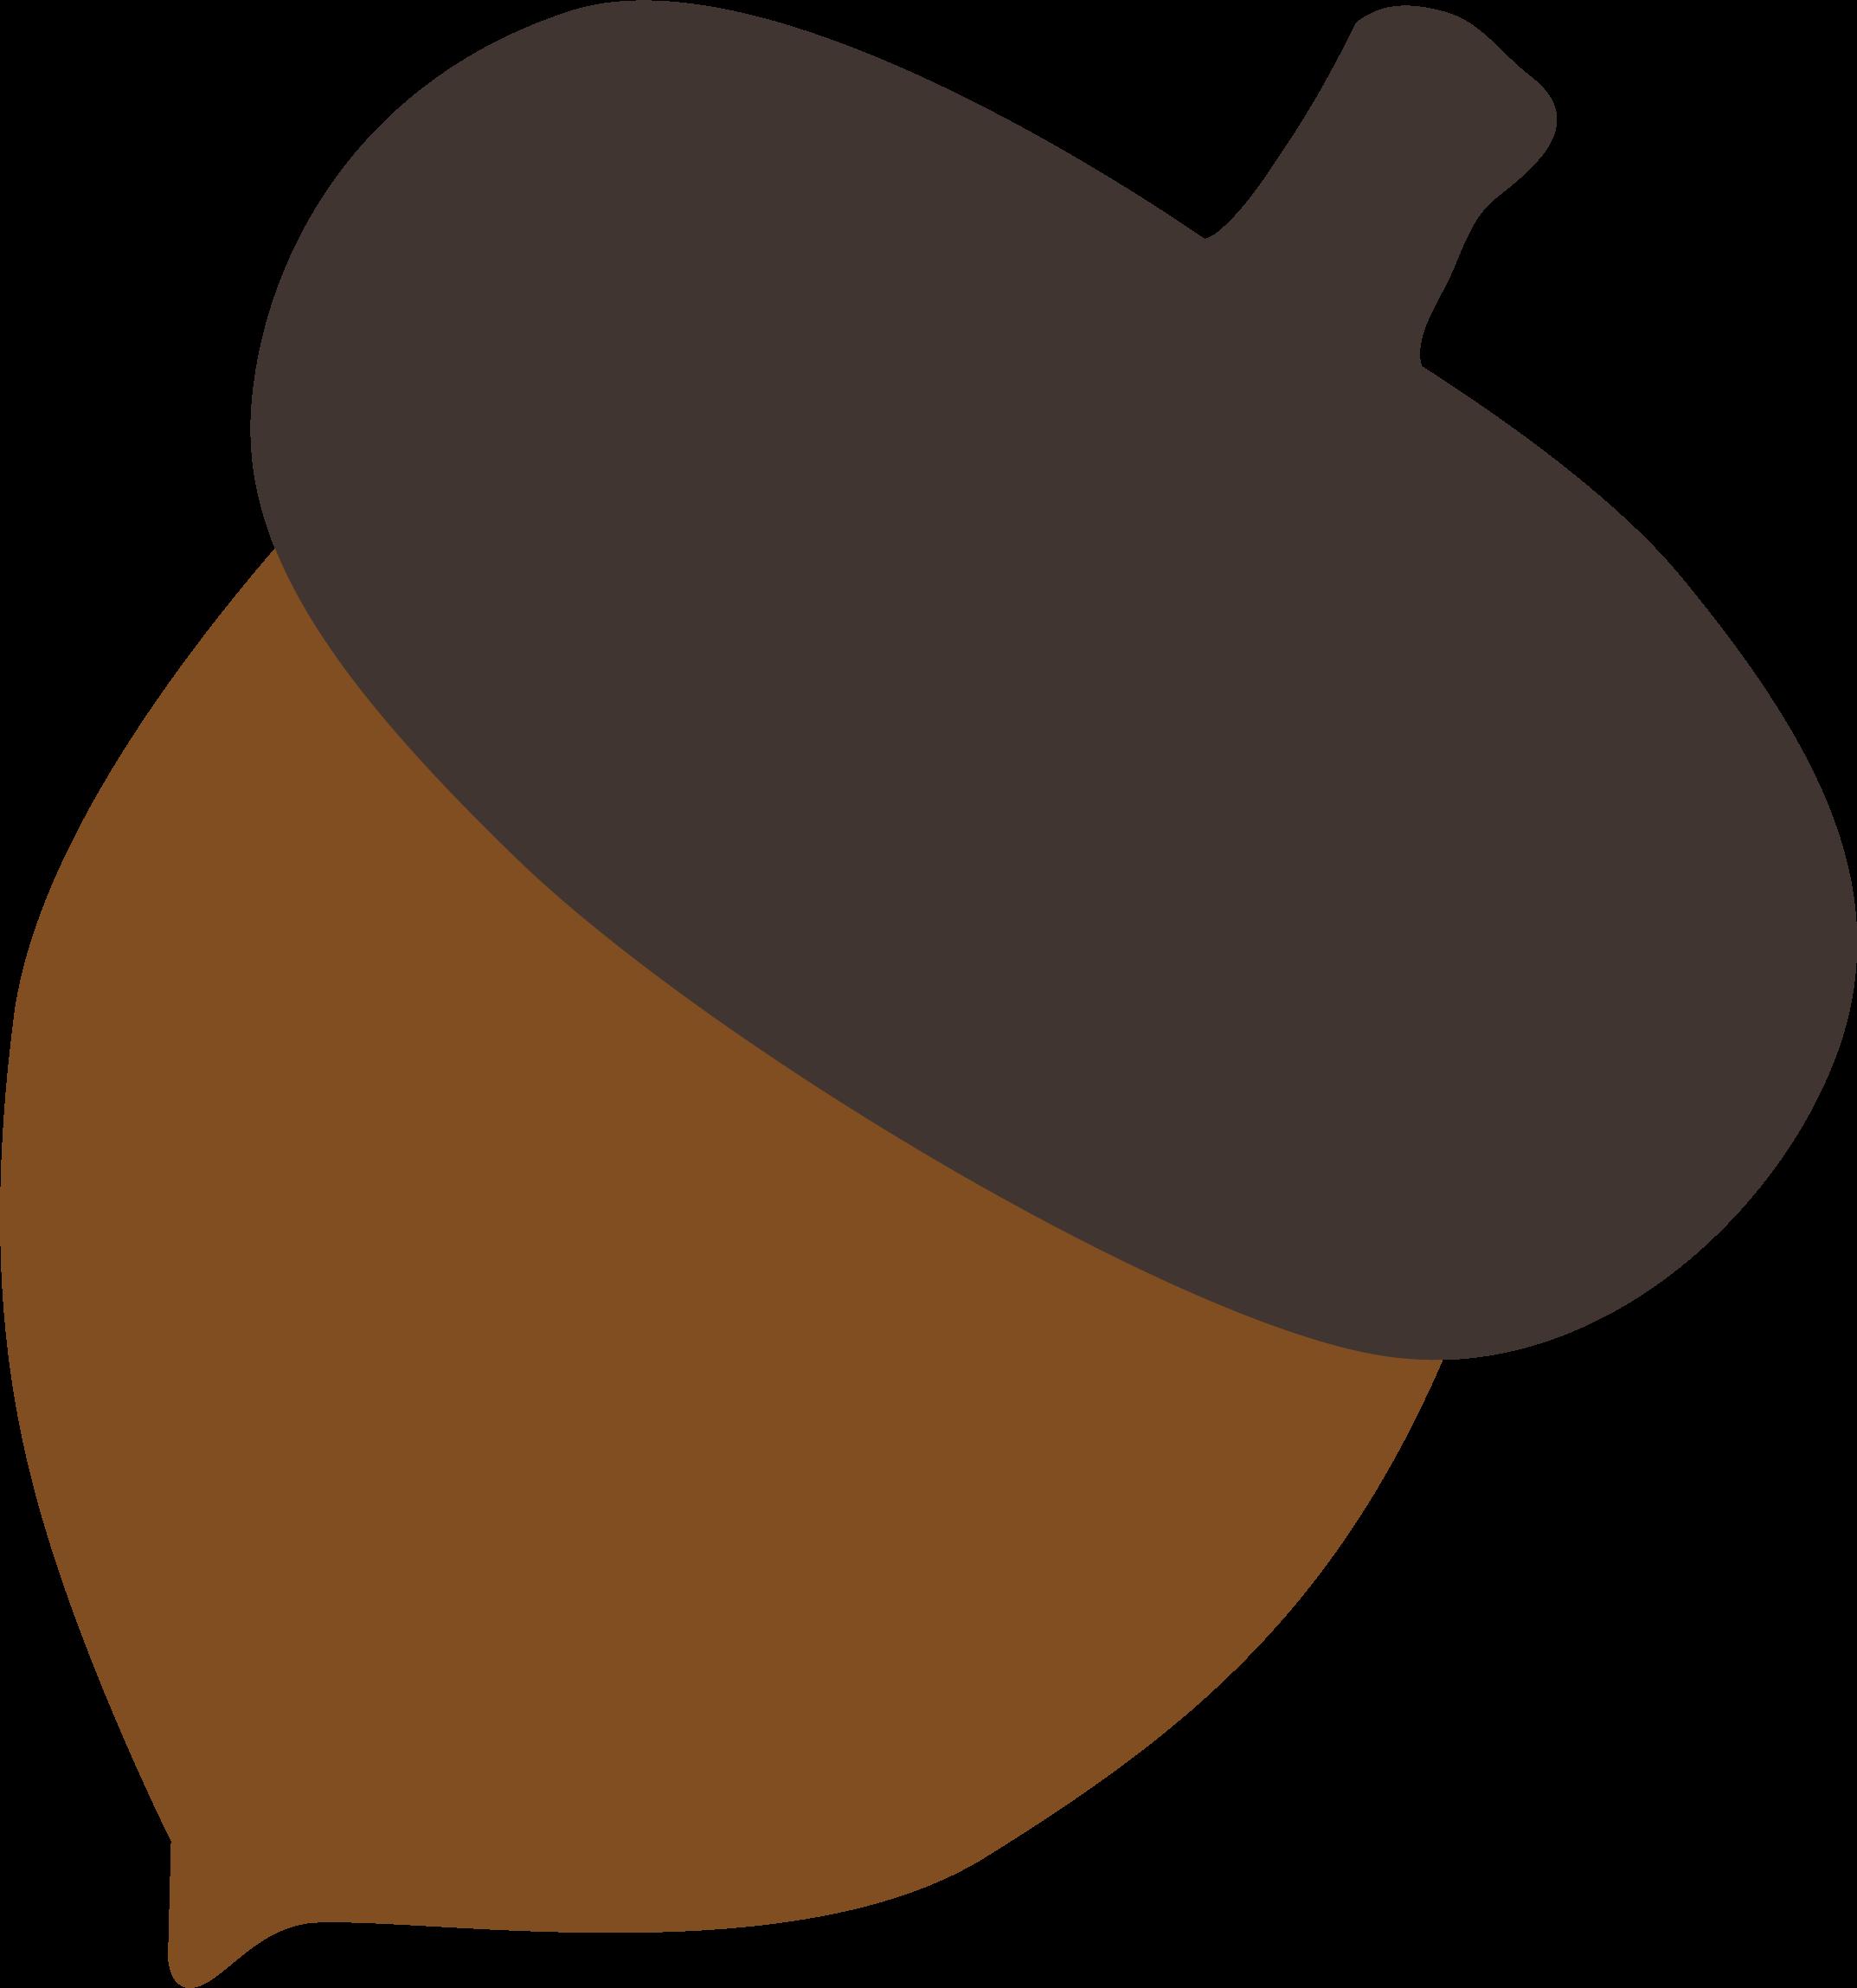 My Favorite Fall Acorn SVG Cut File